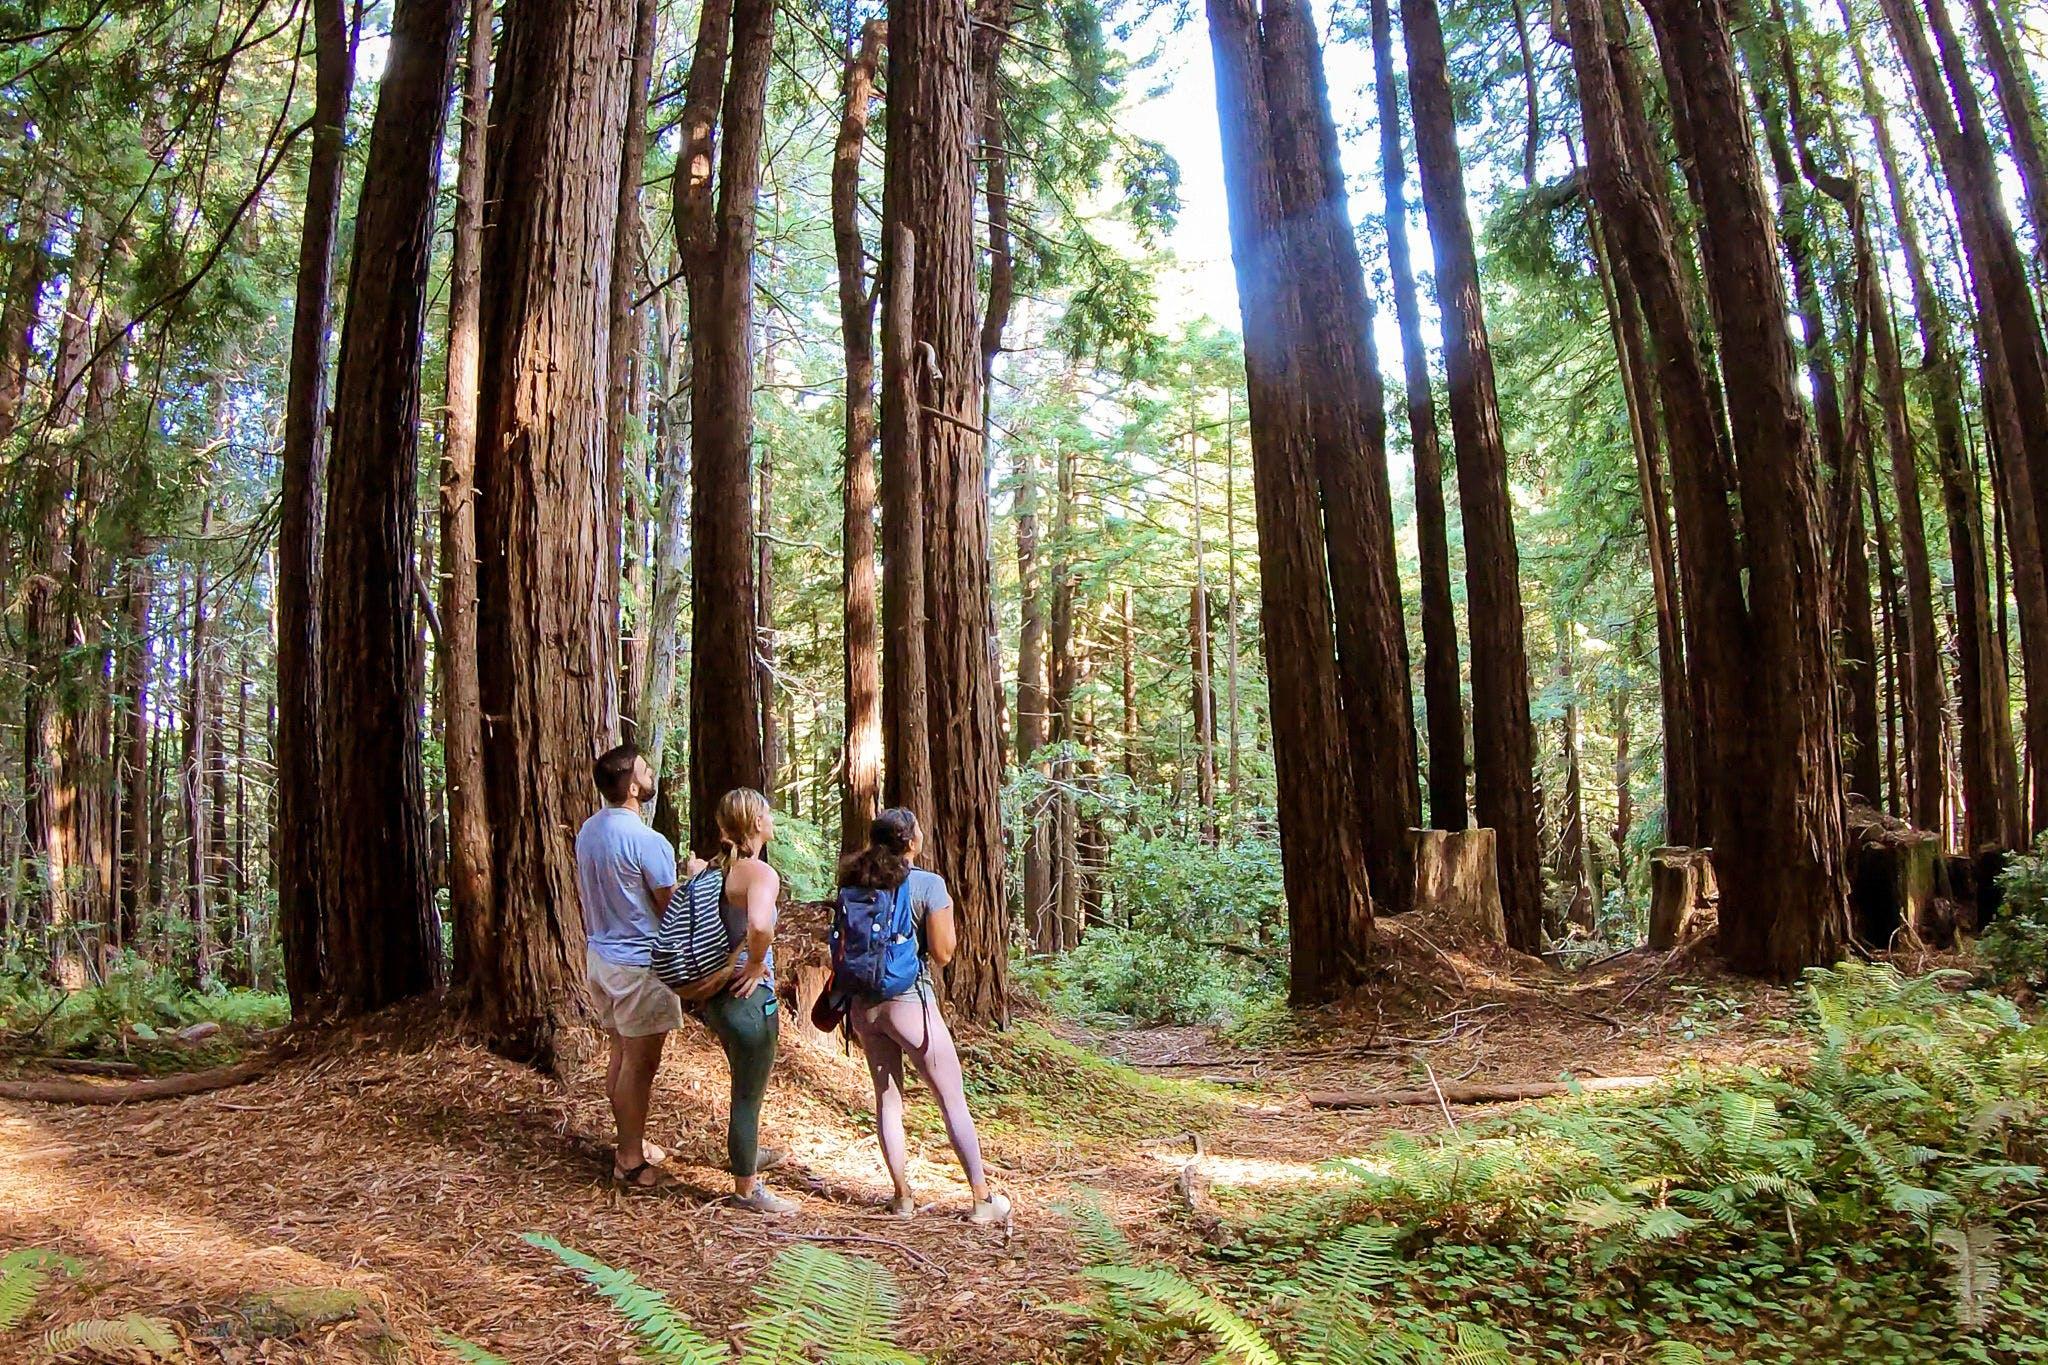 Hike among the redwoods at Pomo Canyon on the Sonoma Coast